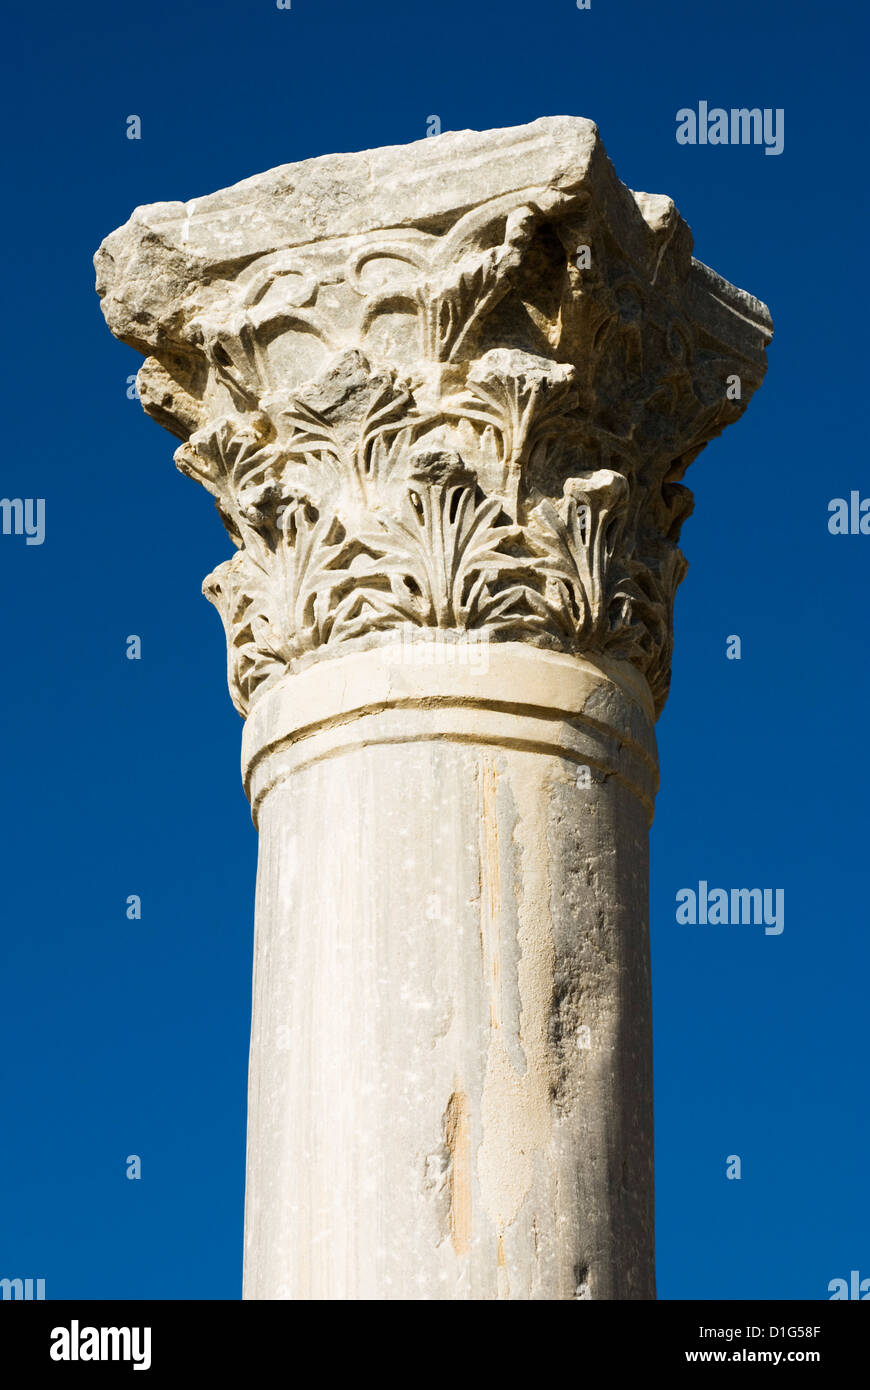 Classical column, Kourion (Curium), Limassol, Cyprus, Europe - Stock Image